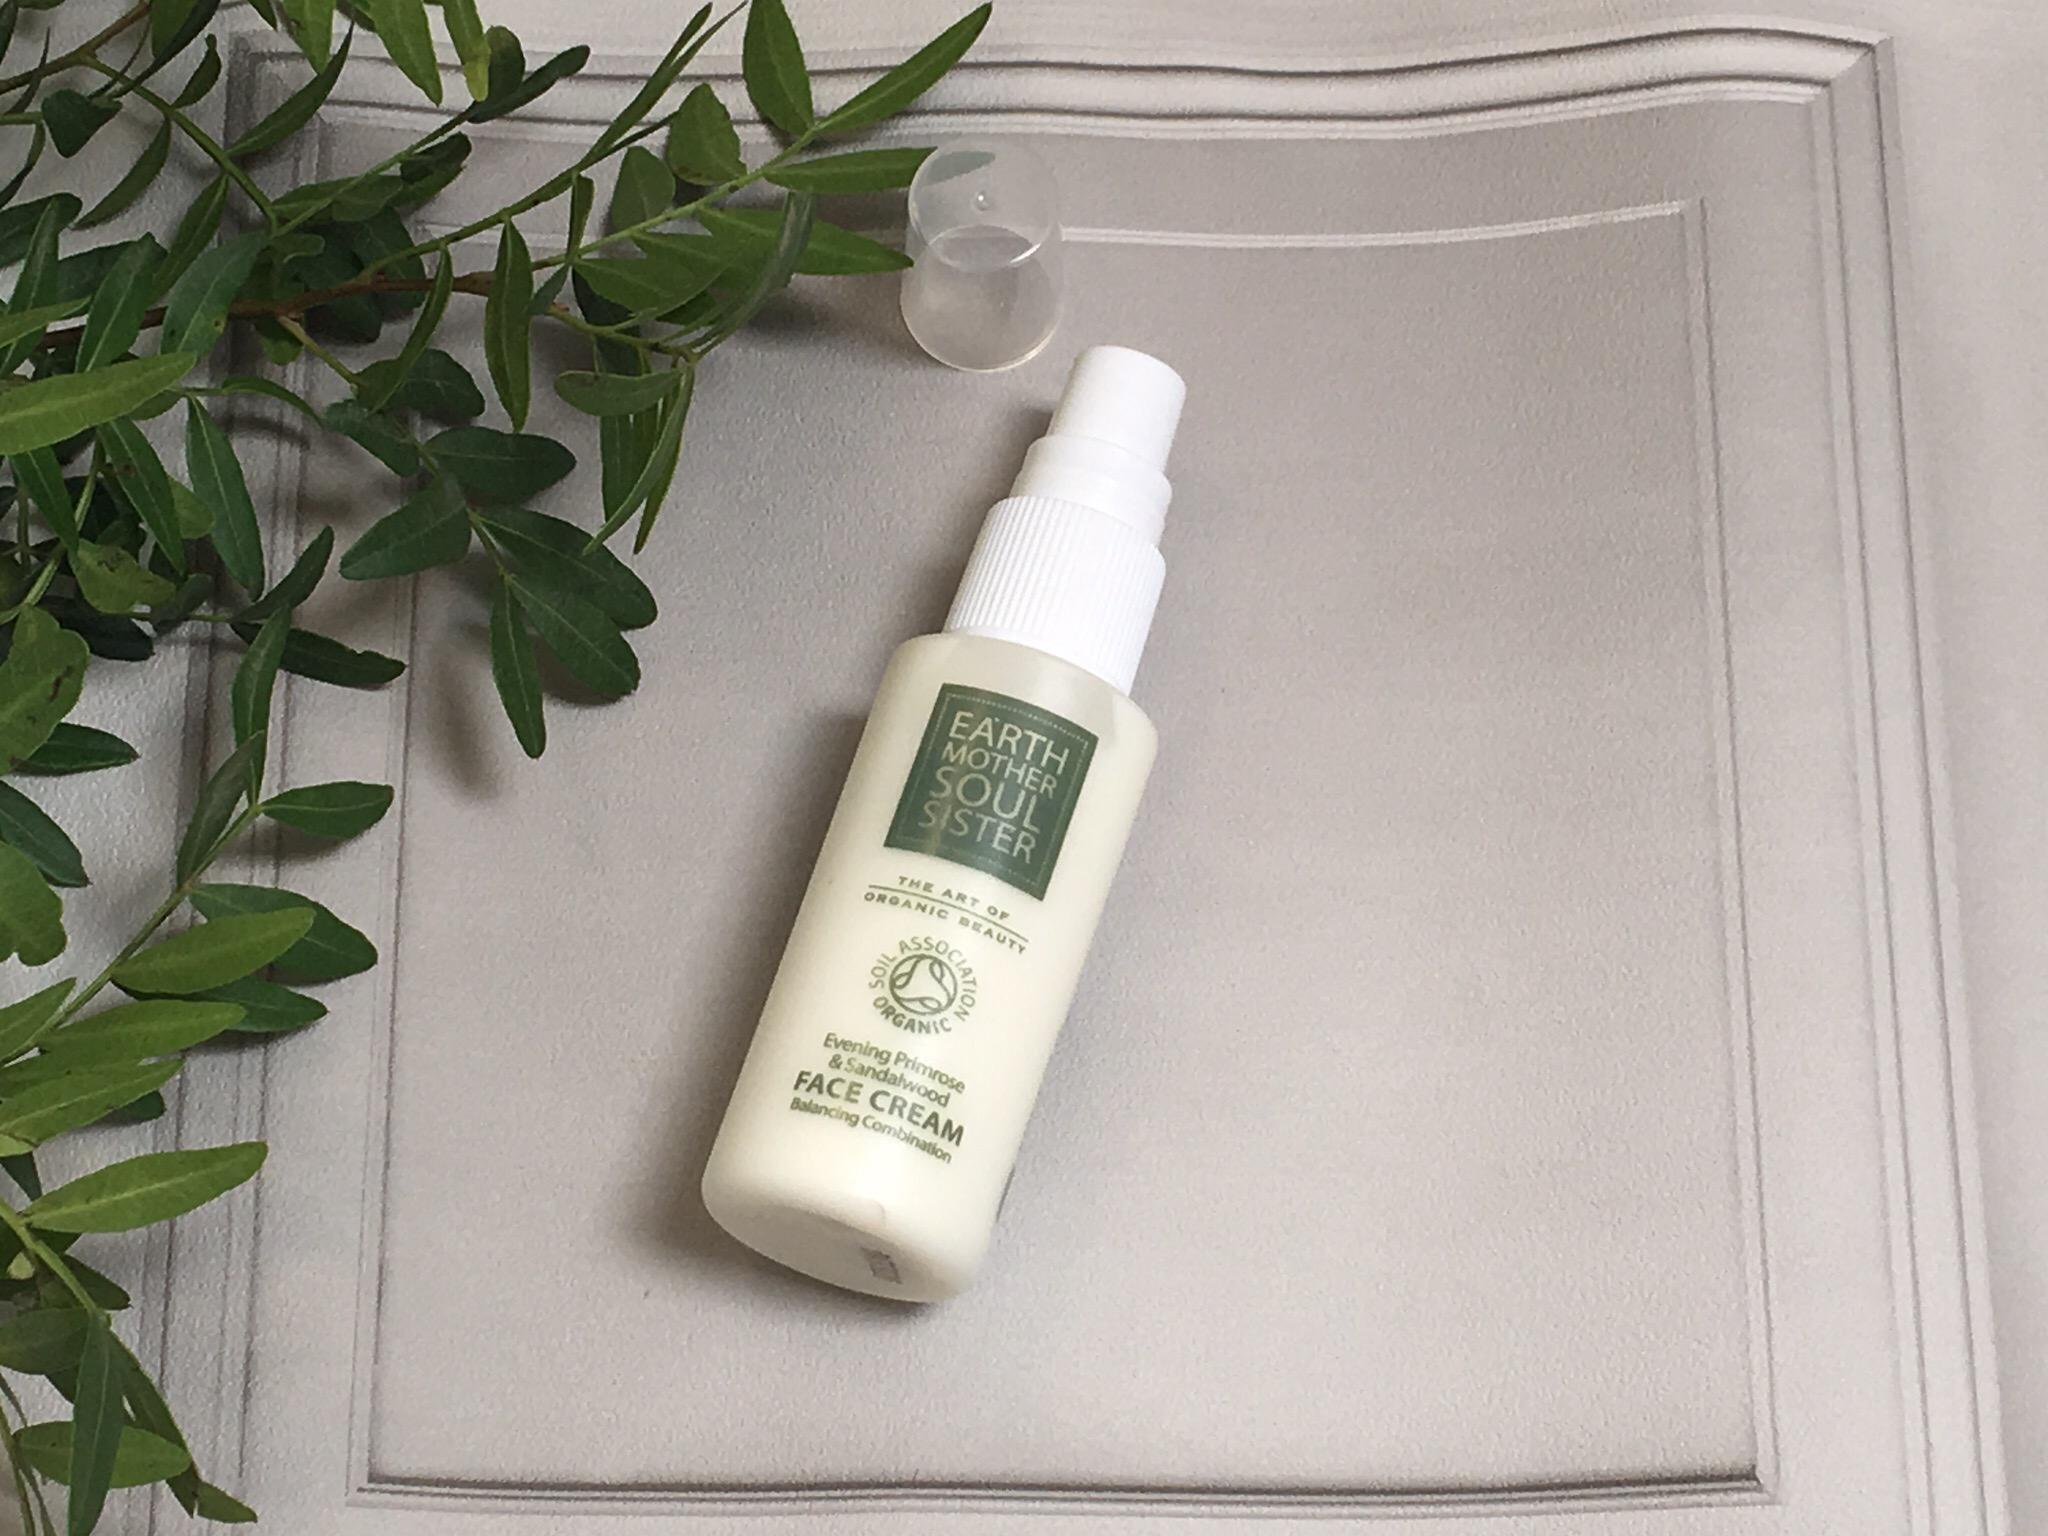 Earth Mother Soul Sister Evening Primrose & Sandalwood Face Cream